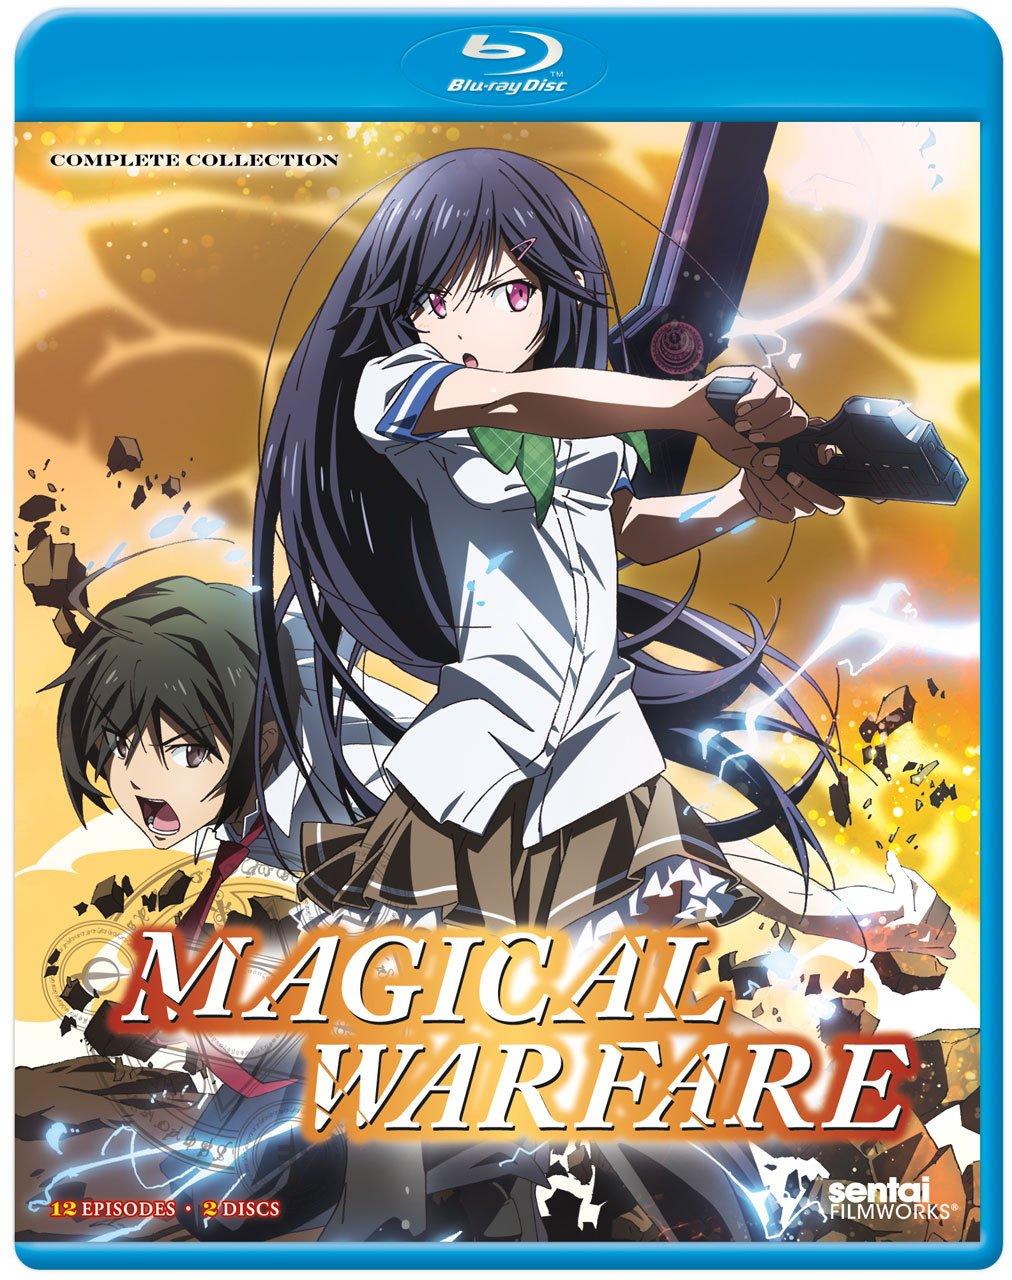 mahou sensou, magical warfare, anime, mui aiba, takeshi nanase